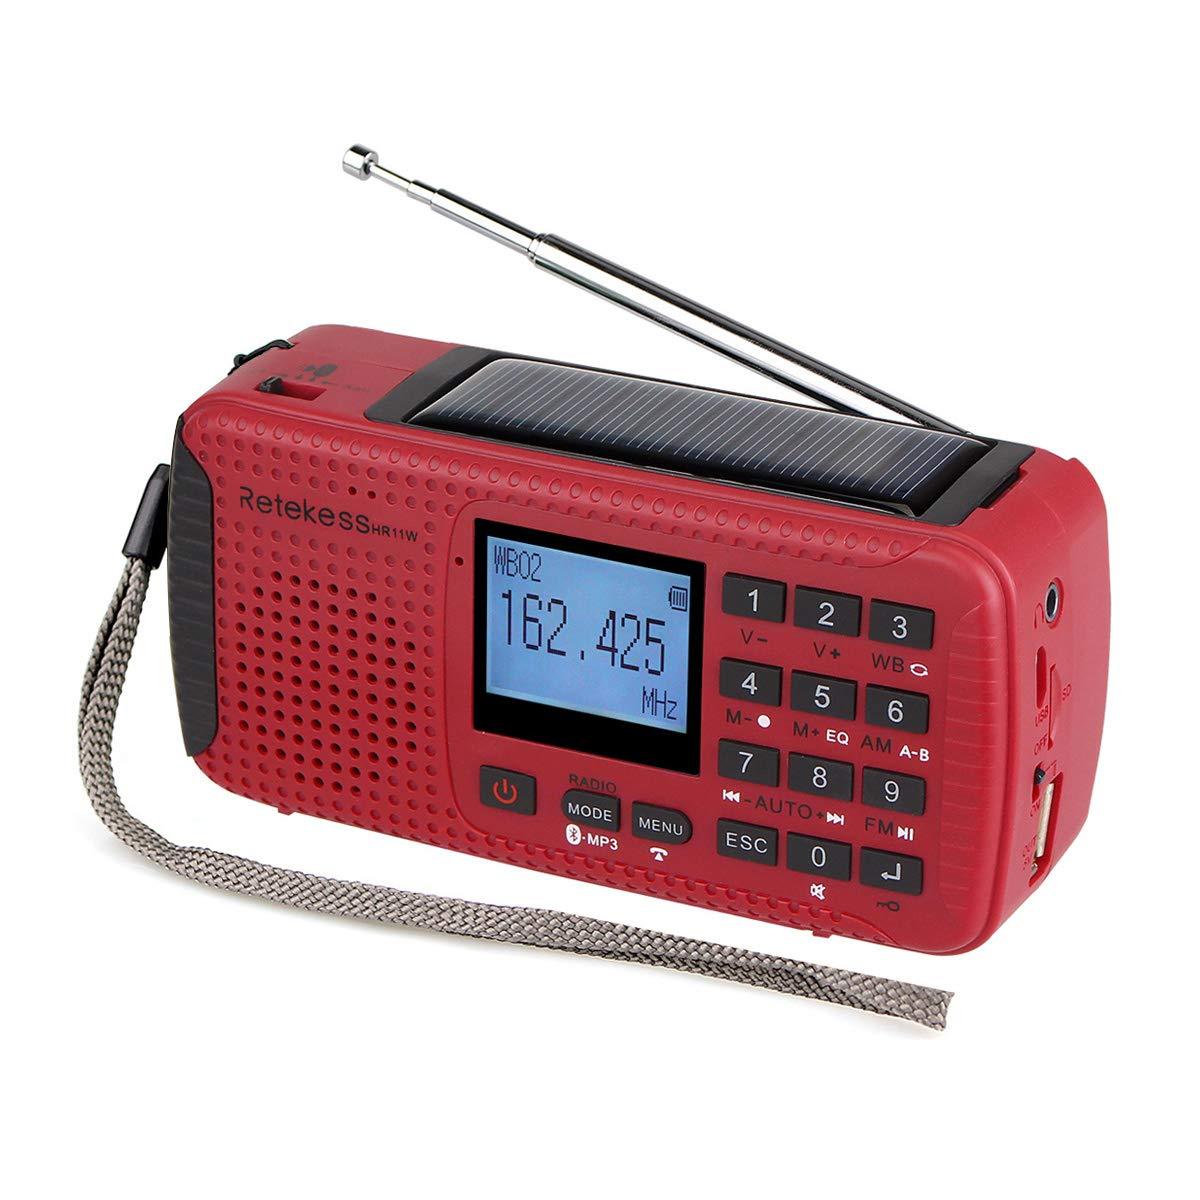 Retekess HR11W Weather Radio NOAA AM FM Emergency Radio Solar Power Dynamo Hand Crank Wind Up with Alarm Clock Wireless MP3 Player Digital Recorder Flashlight Outdoor Camping(Red) HR-11W